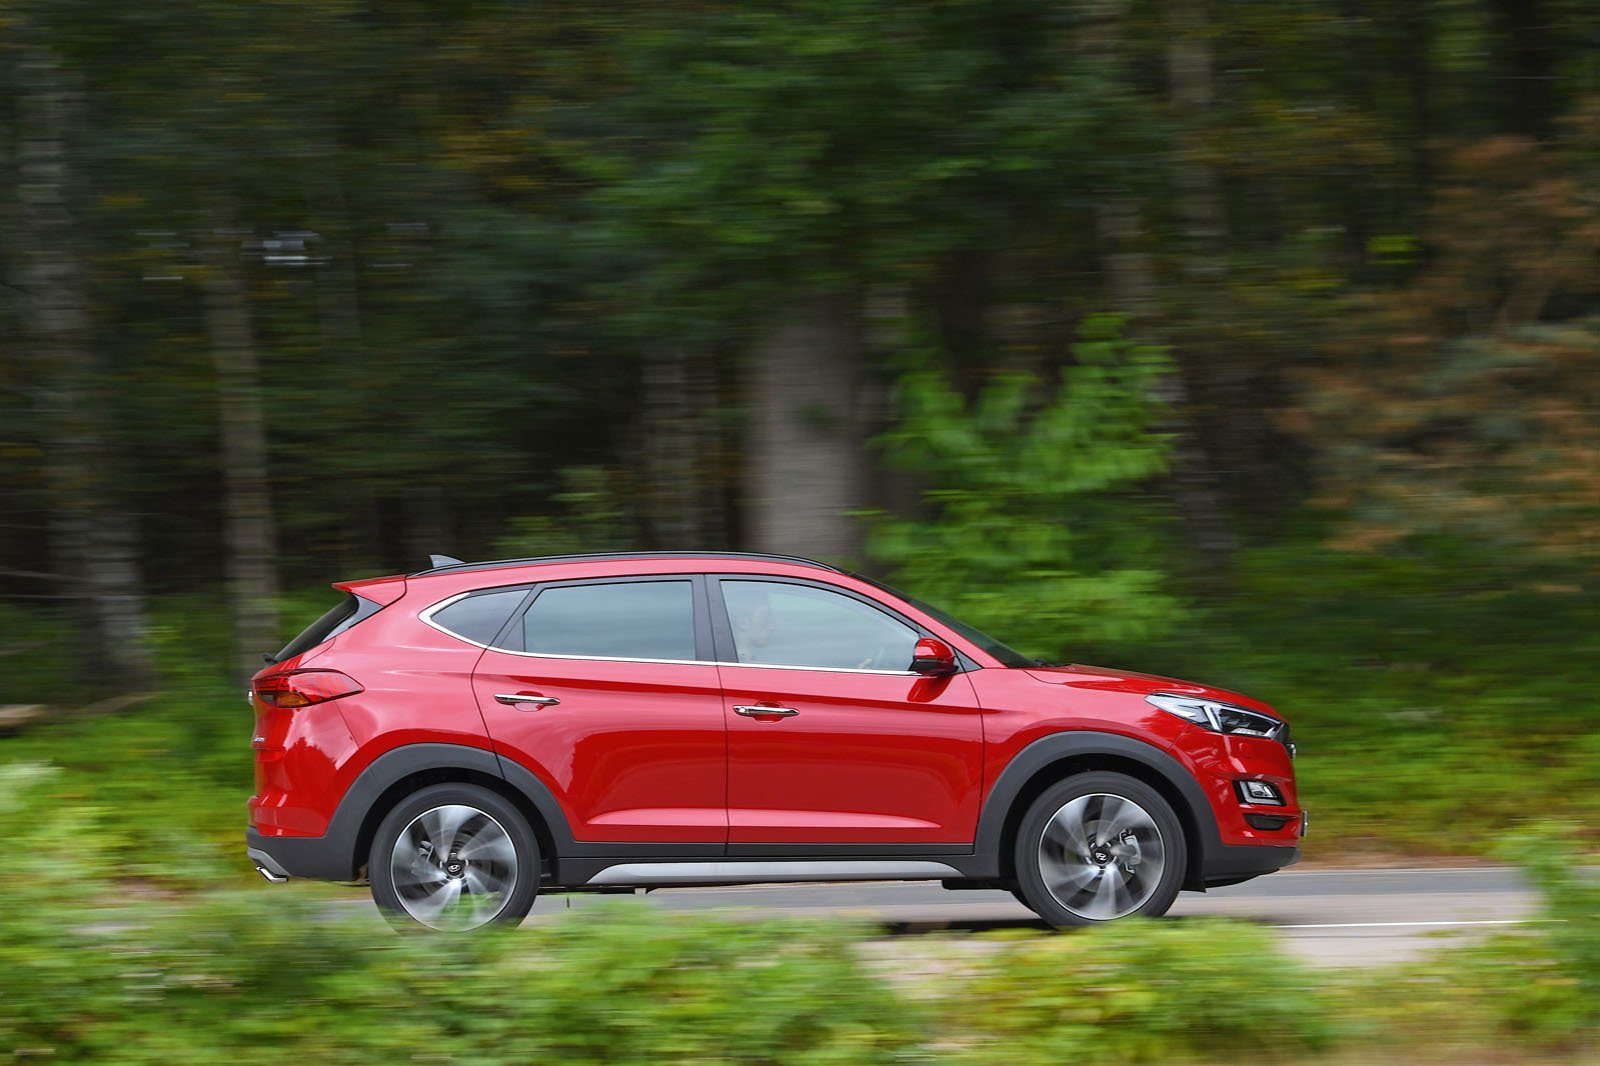 New Hyundai Tucson vs Peugeot 3008 vs Skoda Karoq | What Car?